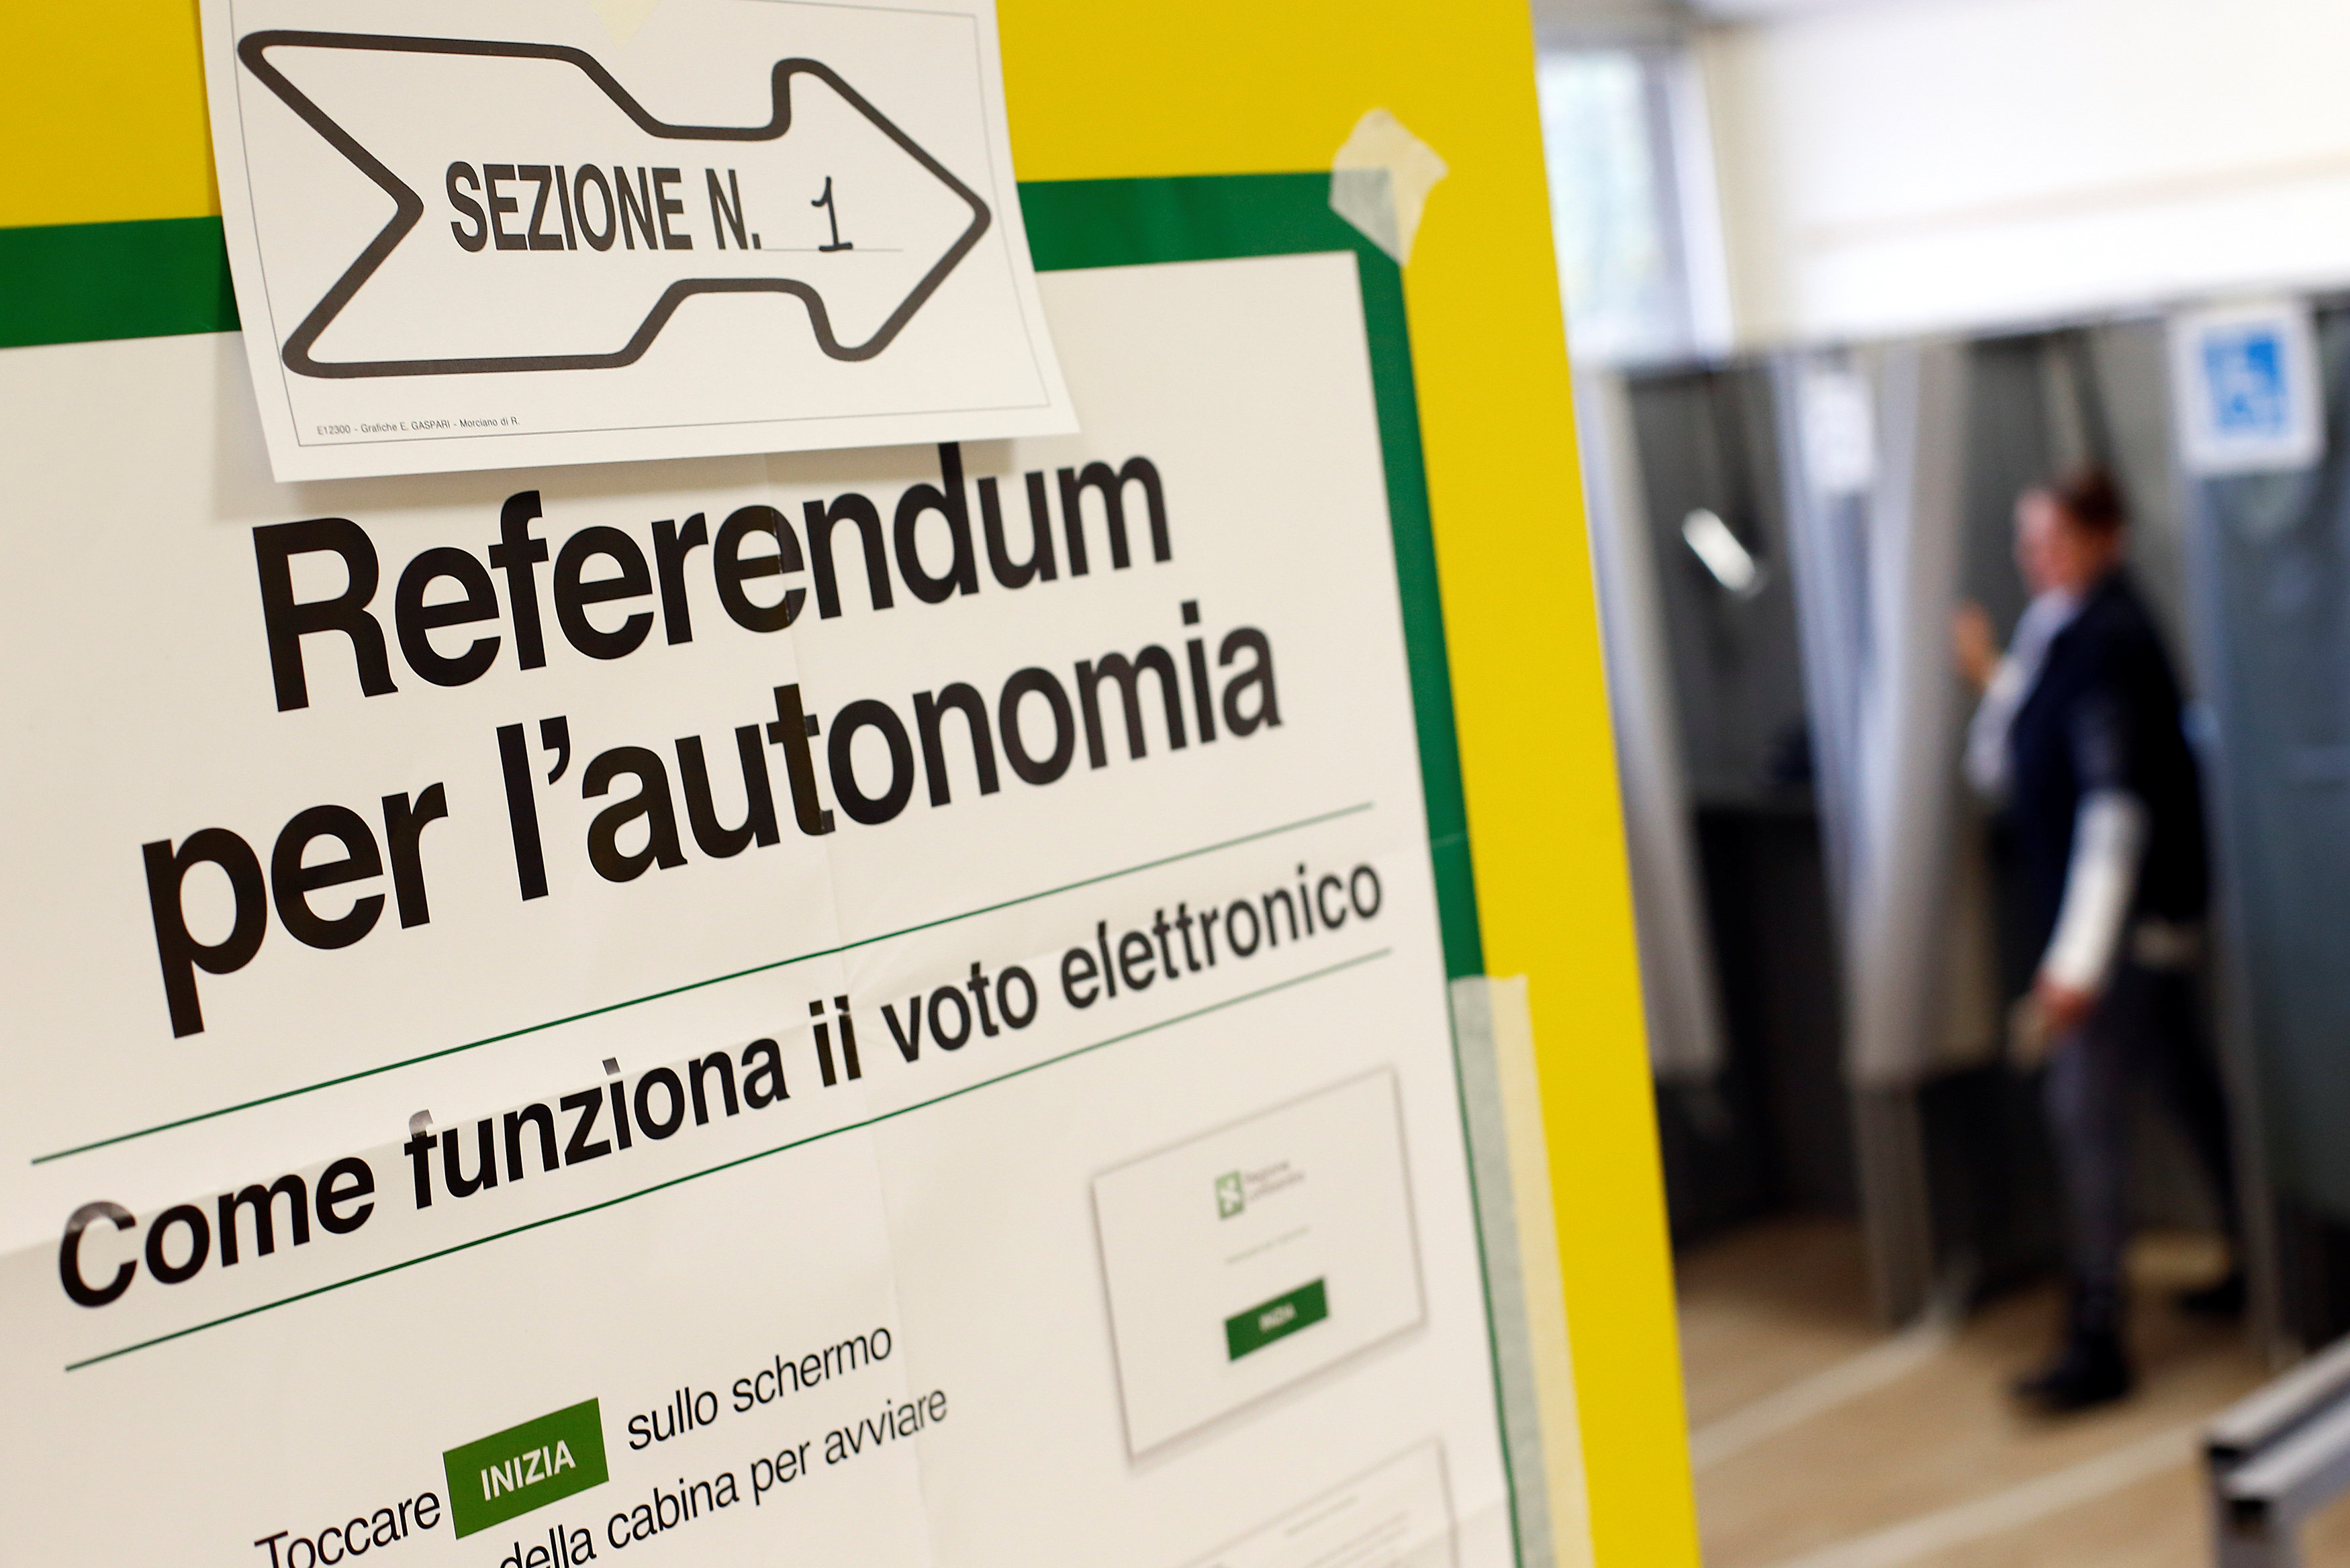 2017 10 22T093107Z 672668953 RC1969B487D0 RTRMADP 3 ITALY POLITICS REFERENDUM